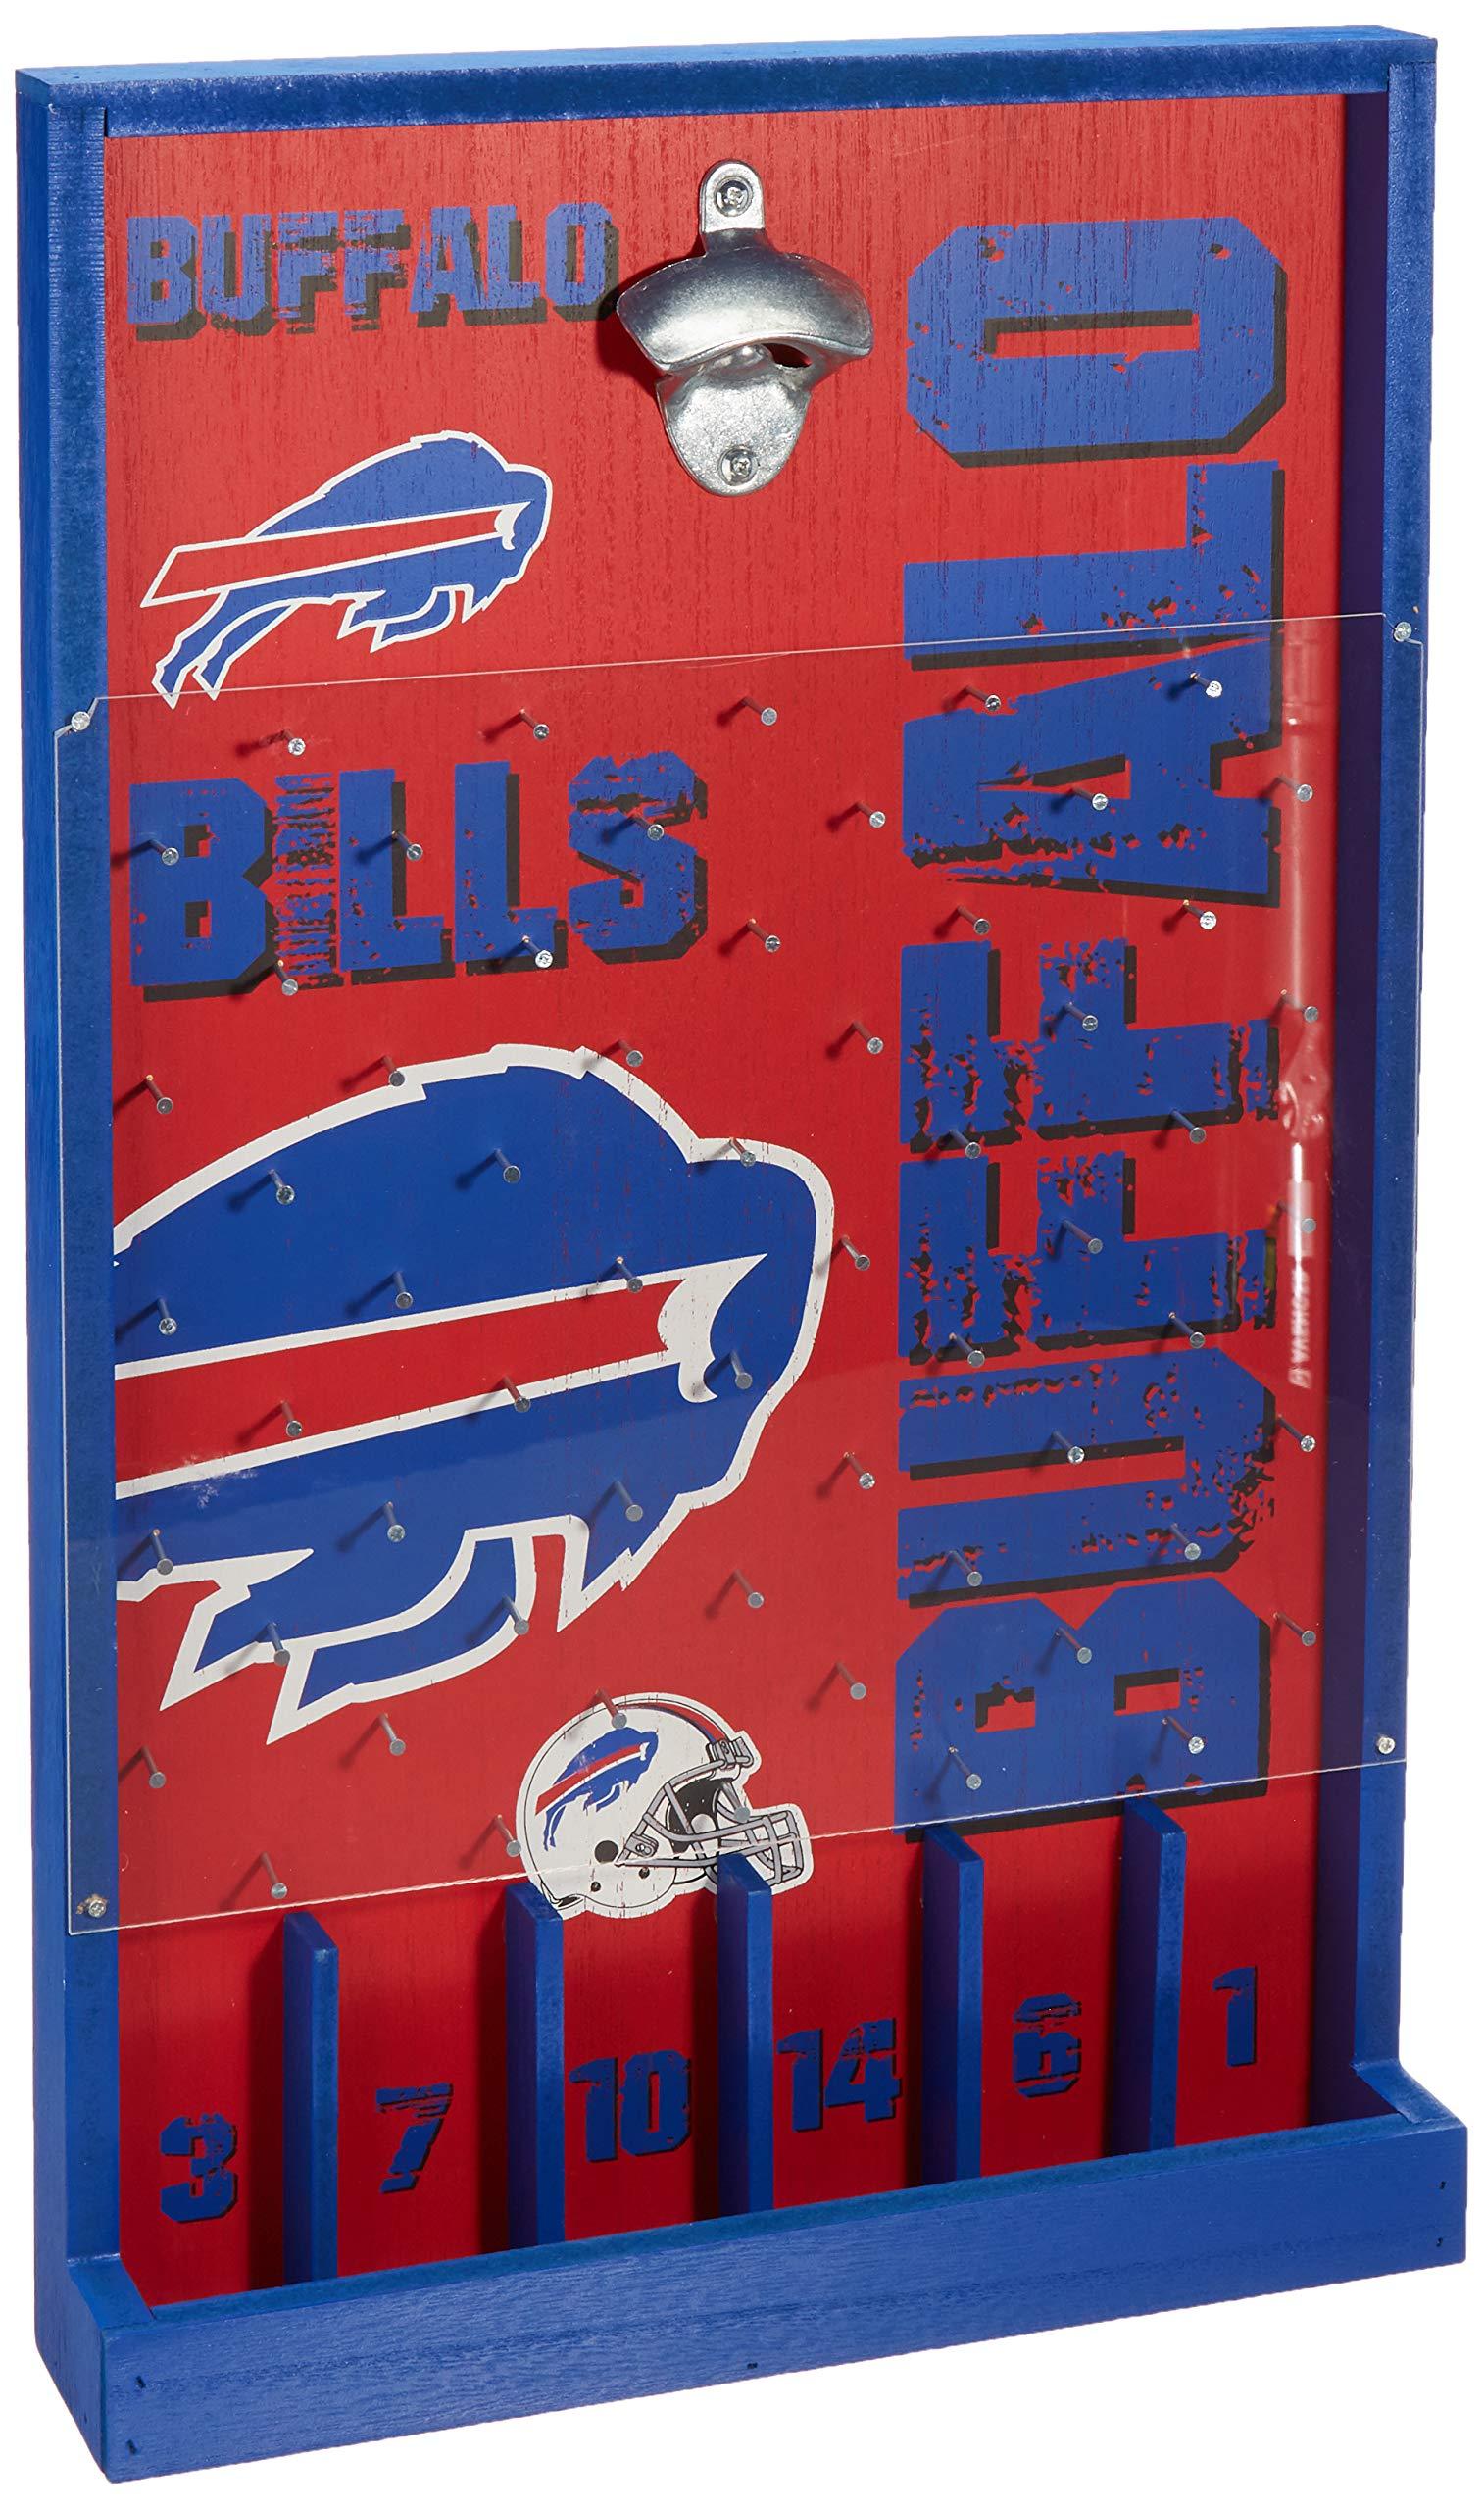 FOCO Buffalo Bills Bottle Opener Sign Game by FOCO